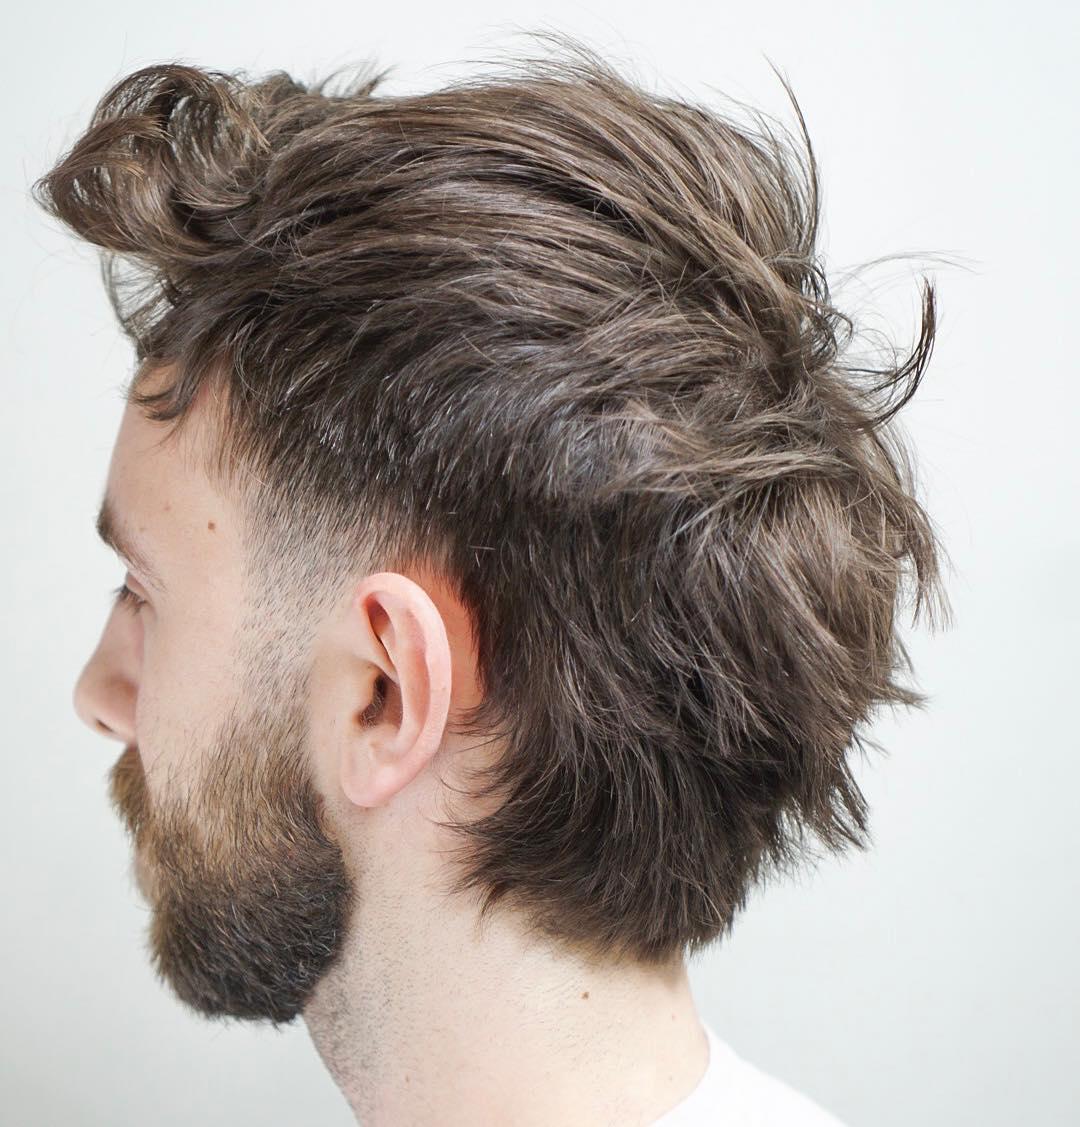 Messy mullet haircut